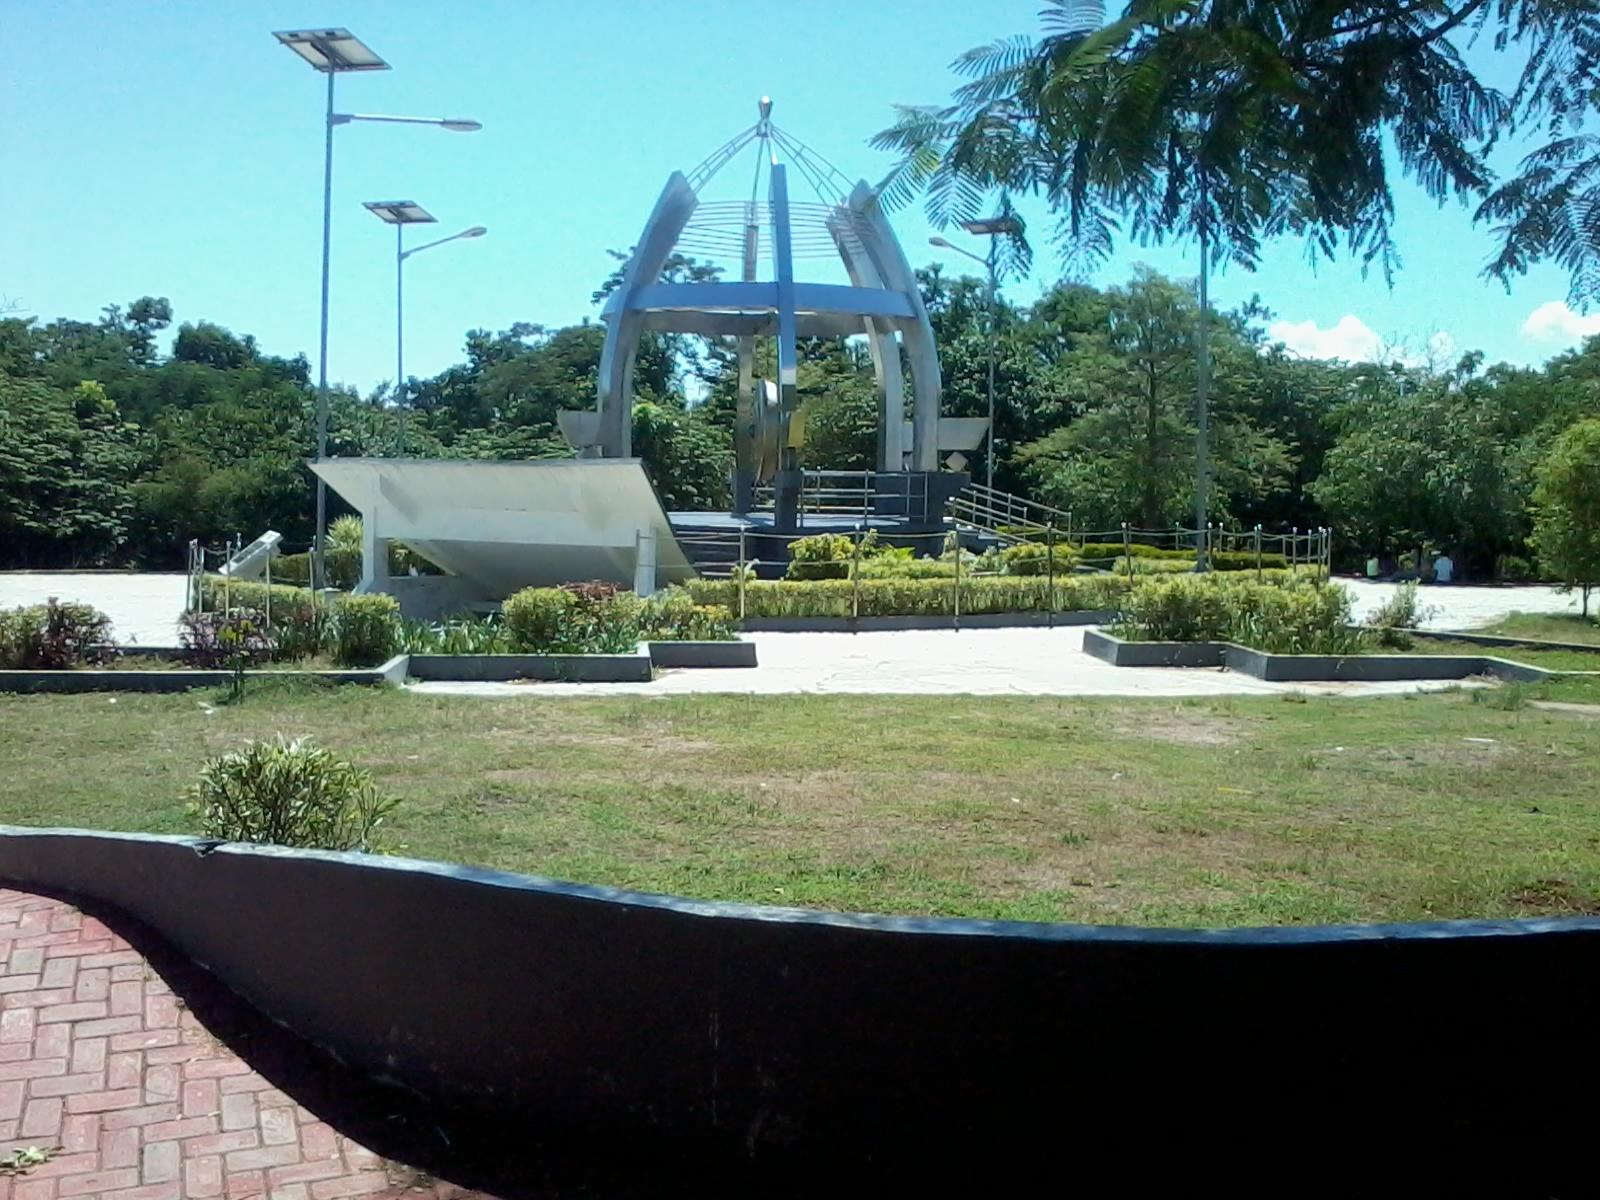 Taman Nostalgia Kota Kupang Haidi Barasa 2014 04 19 11